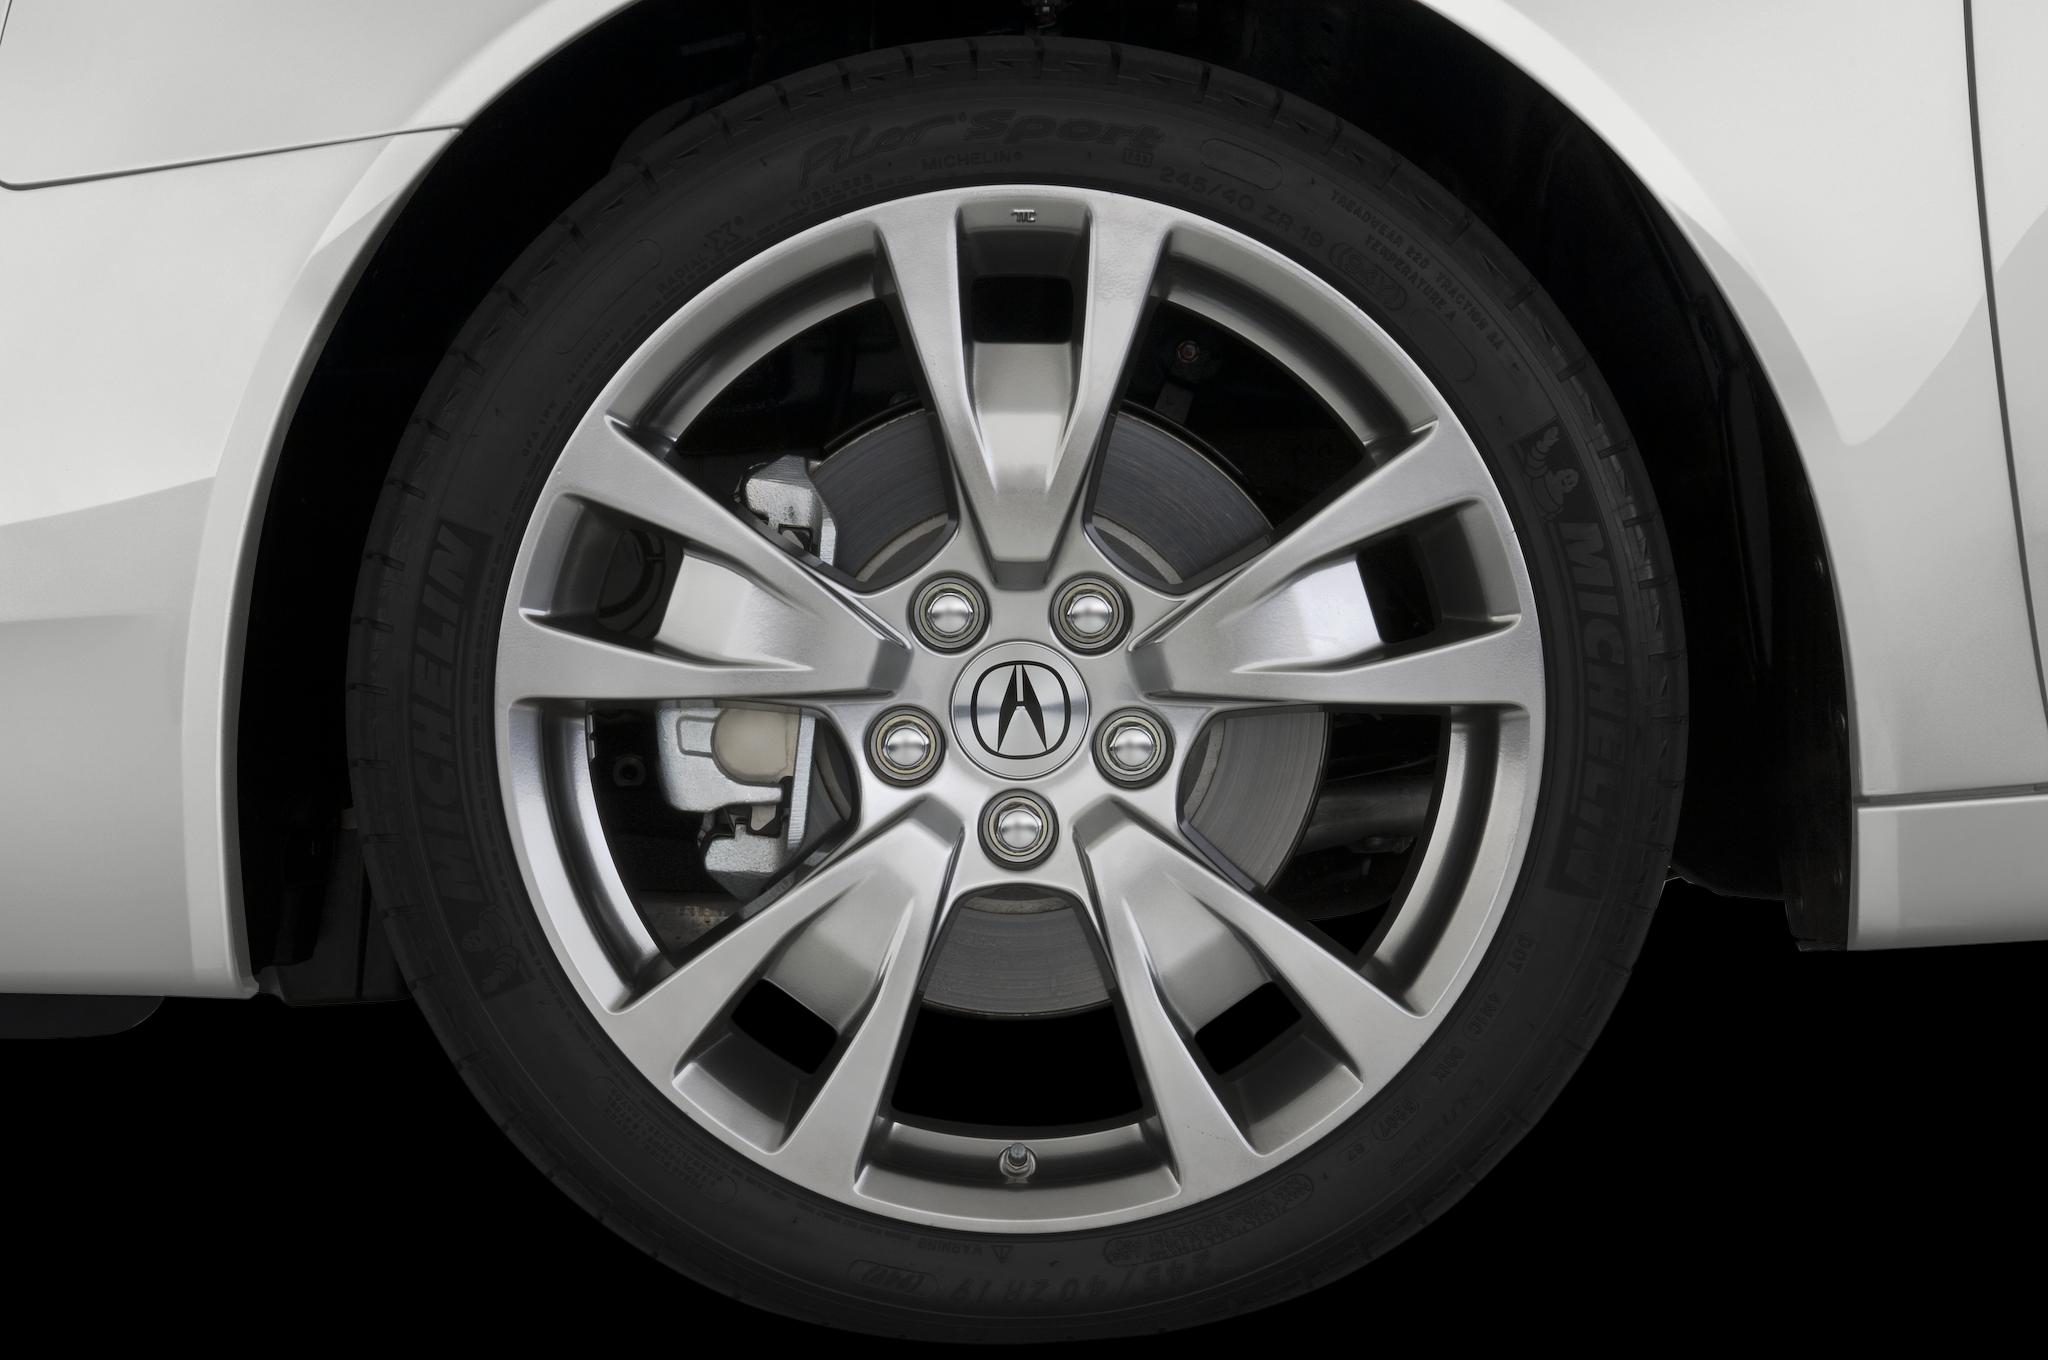 2010 acura tl sh awd 6mt acura midsize sedan review automobile rh automobilemag com 2010 Acura TL Dash Lights Acura TL Rims